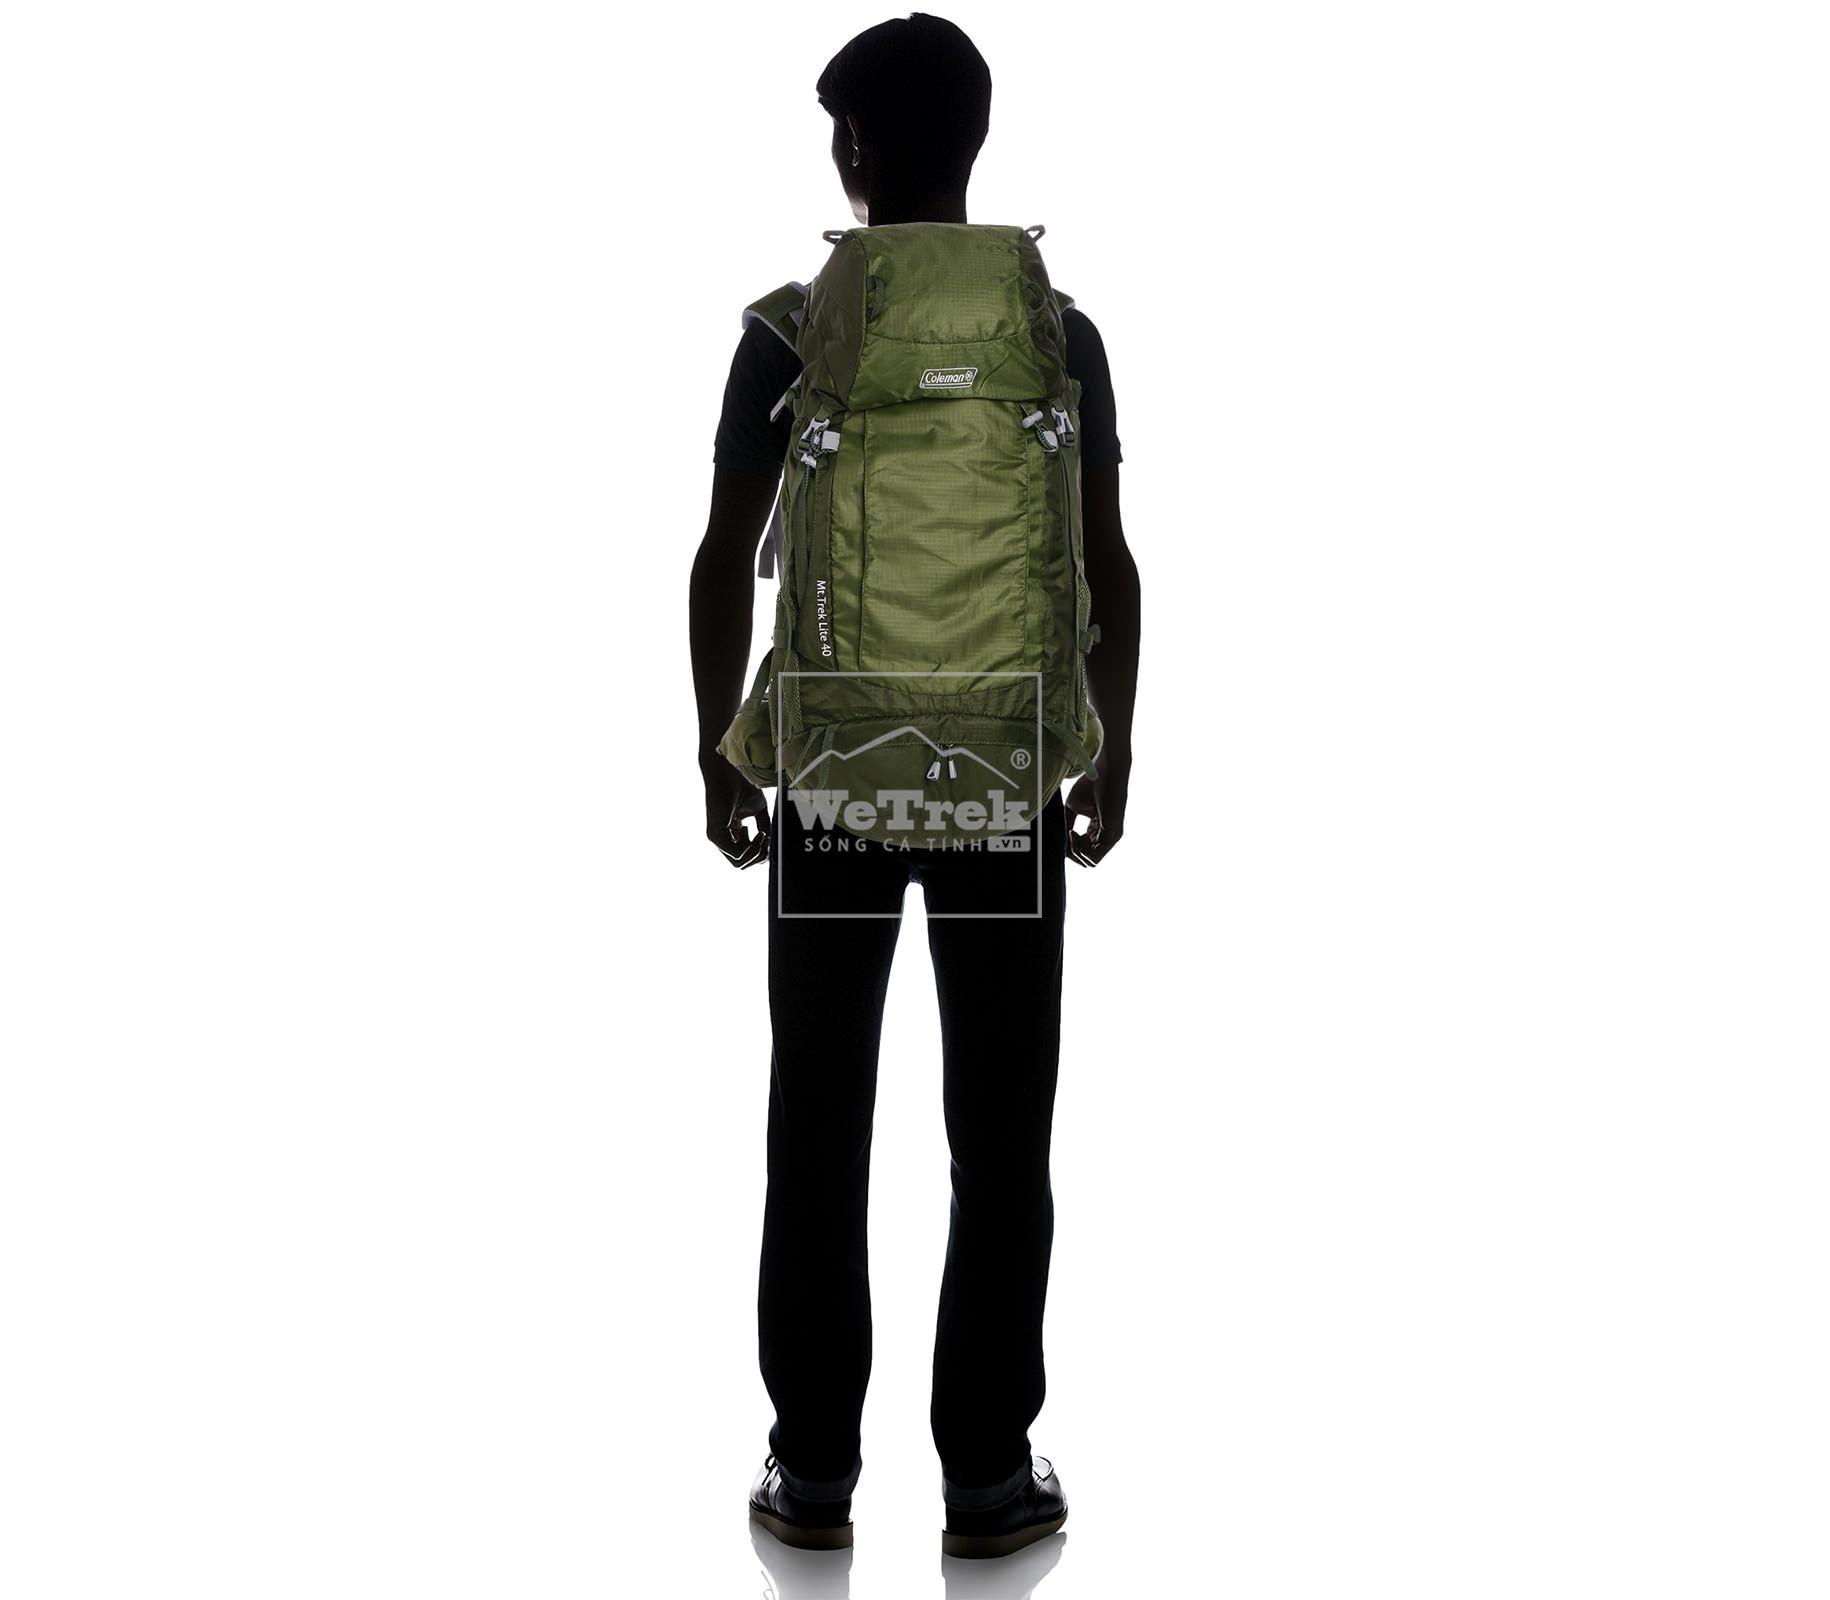 ba-lo-leo-nui-40l-coleman-mttrek-lite-backpack-green-cbb4091gr-7455-wetrek.vn-2